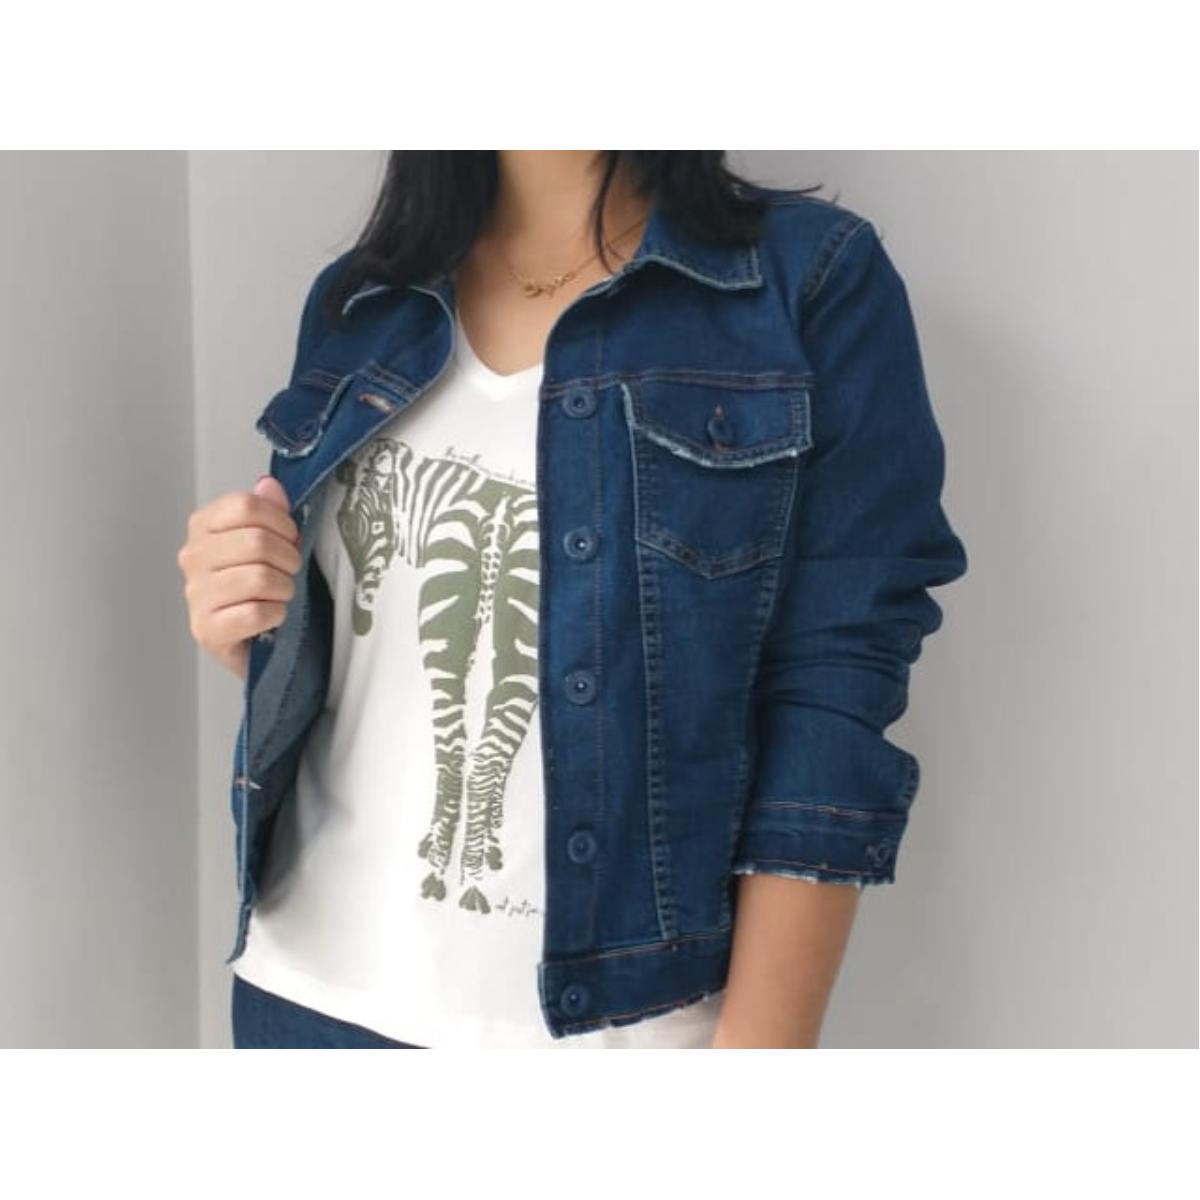 Jaqueta Feminina Lunender 67860 Jeans